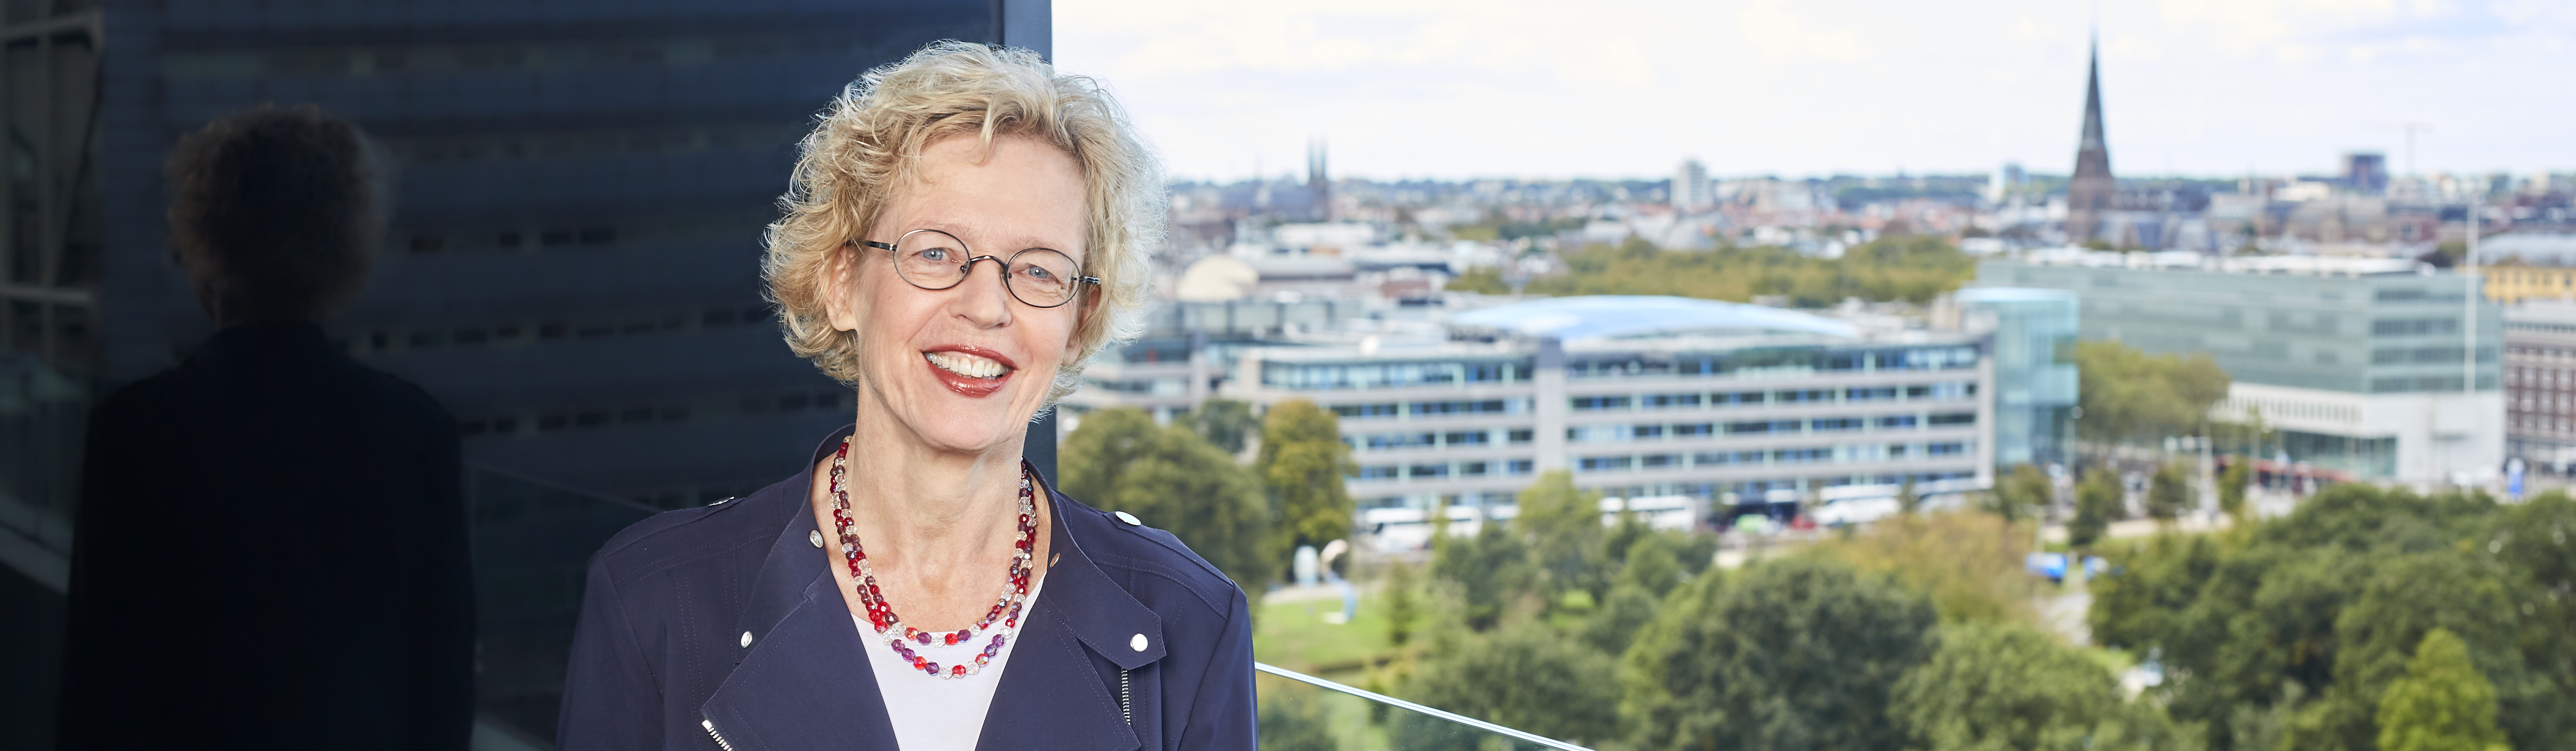 Cécile Bitter, advocaat Pels Rijcken